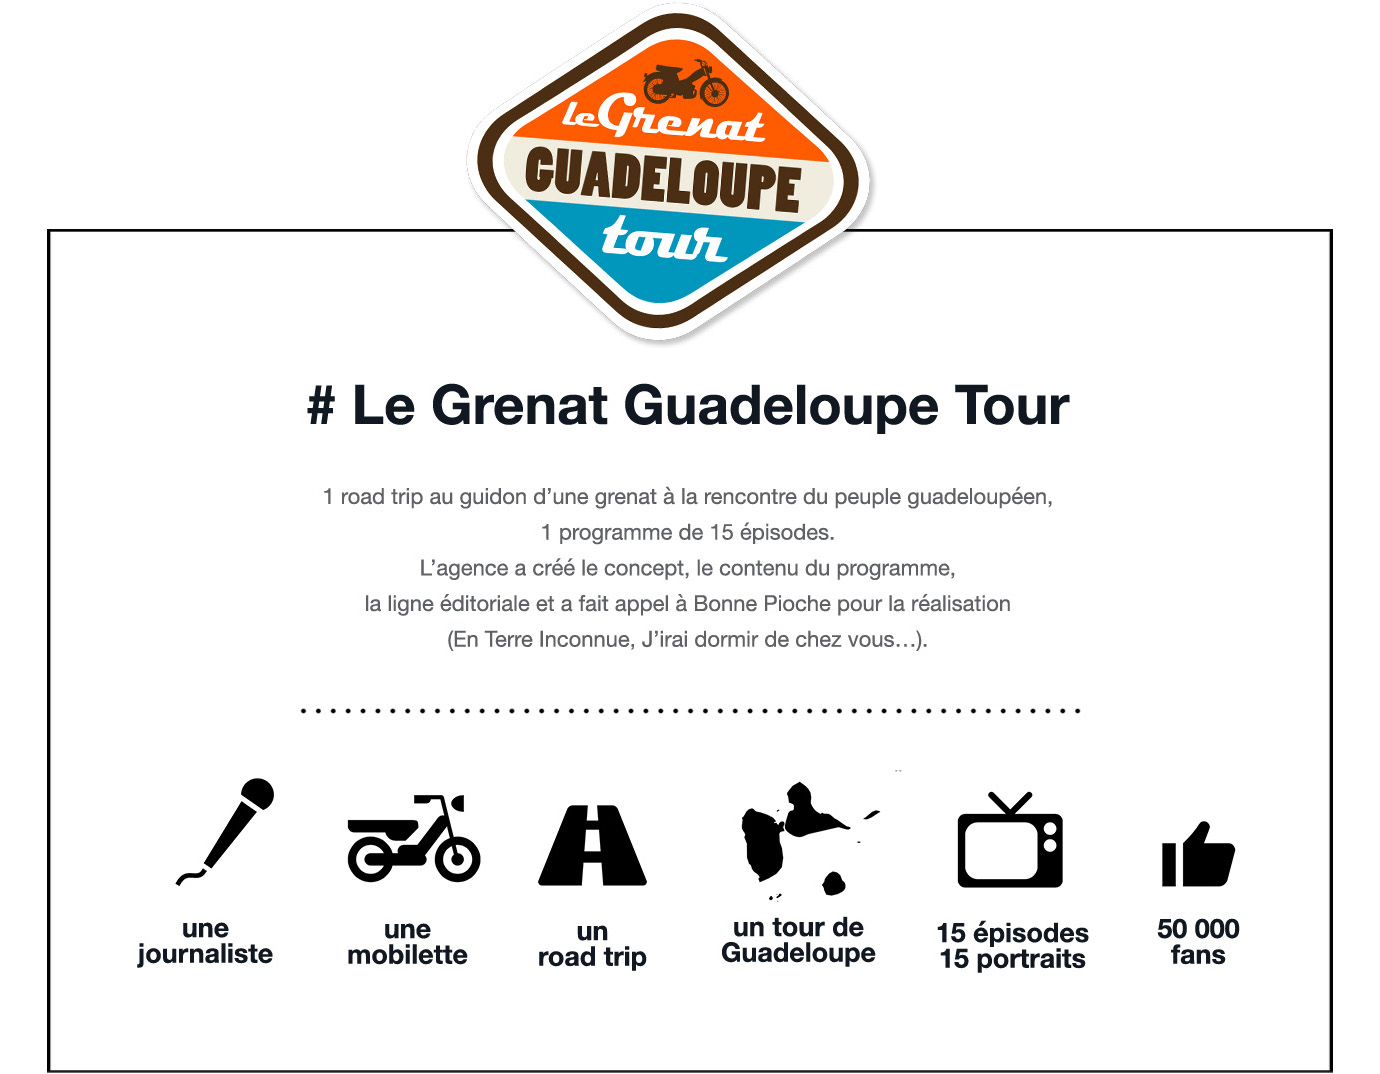 Grenat Guadeloupe Tour Notchup